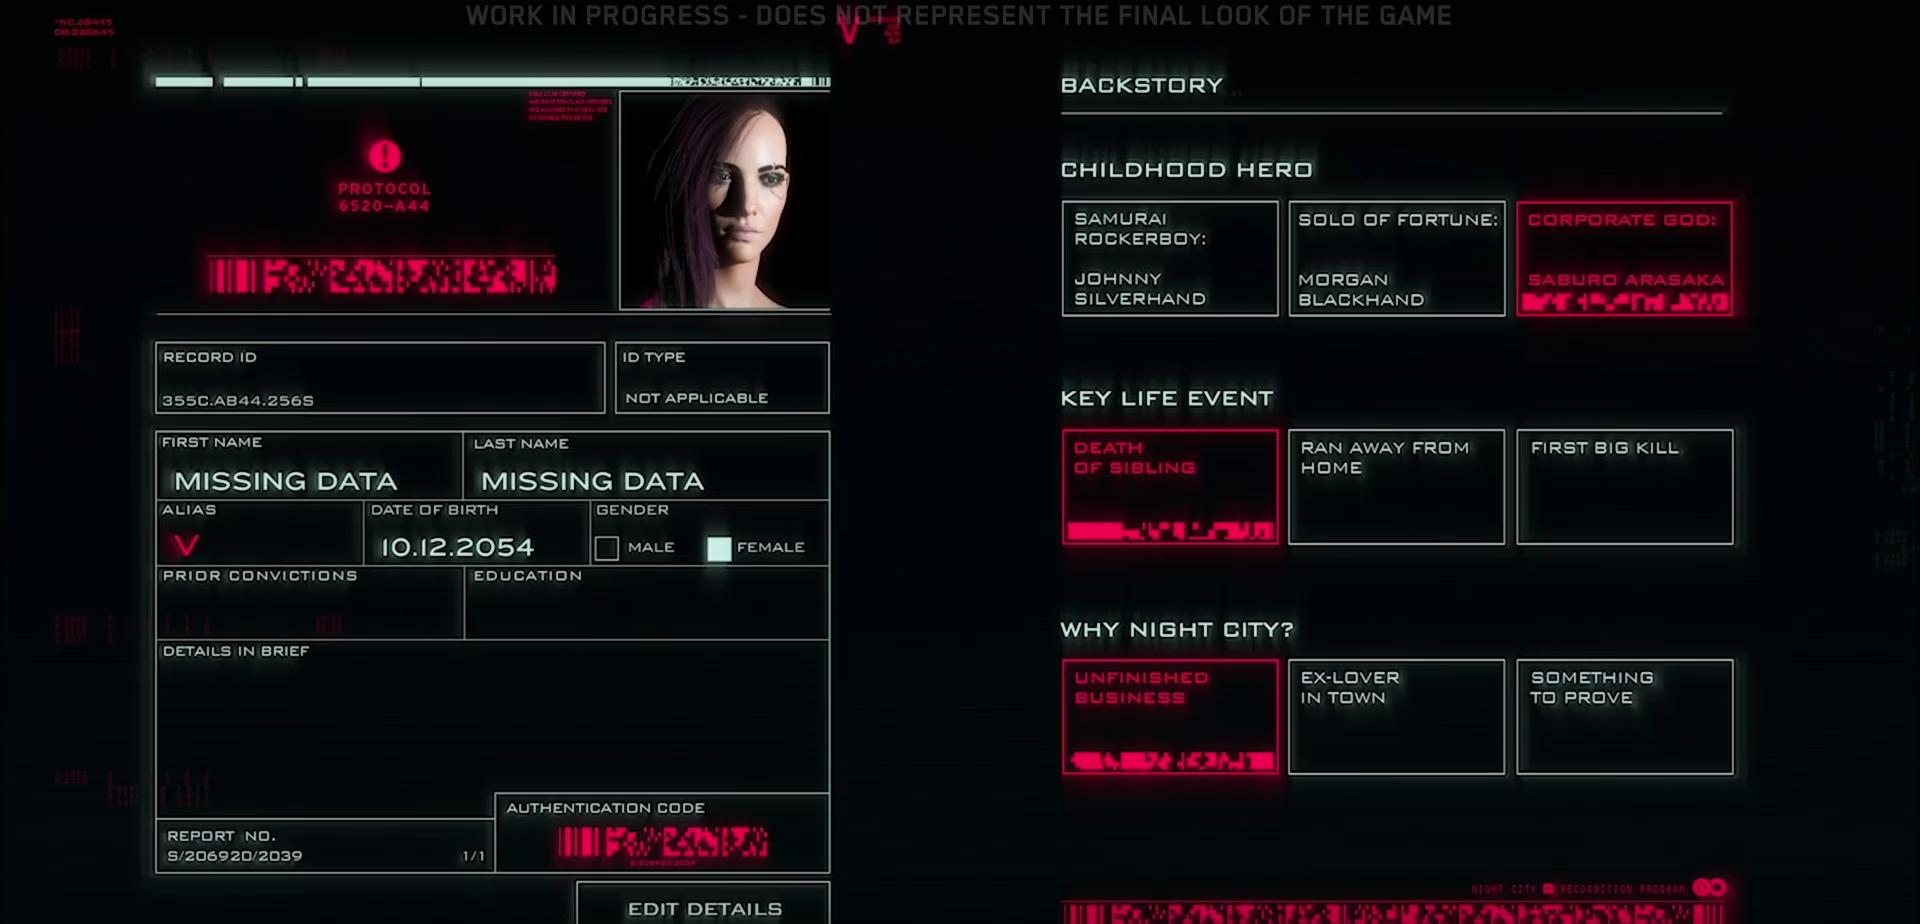 Character_Sheet_-_Cyberpunk_2077.jpg